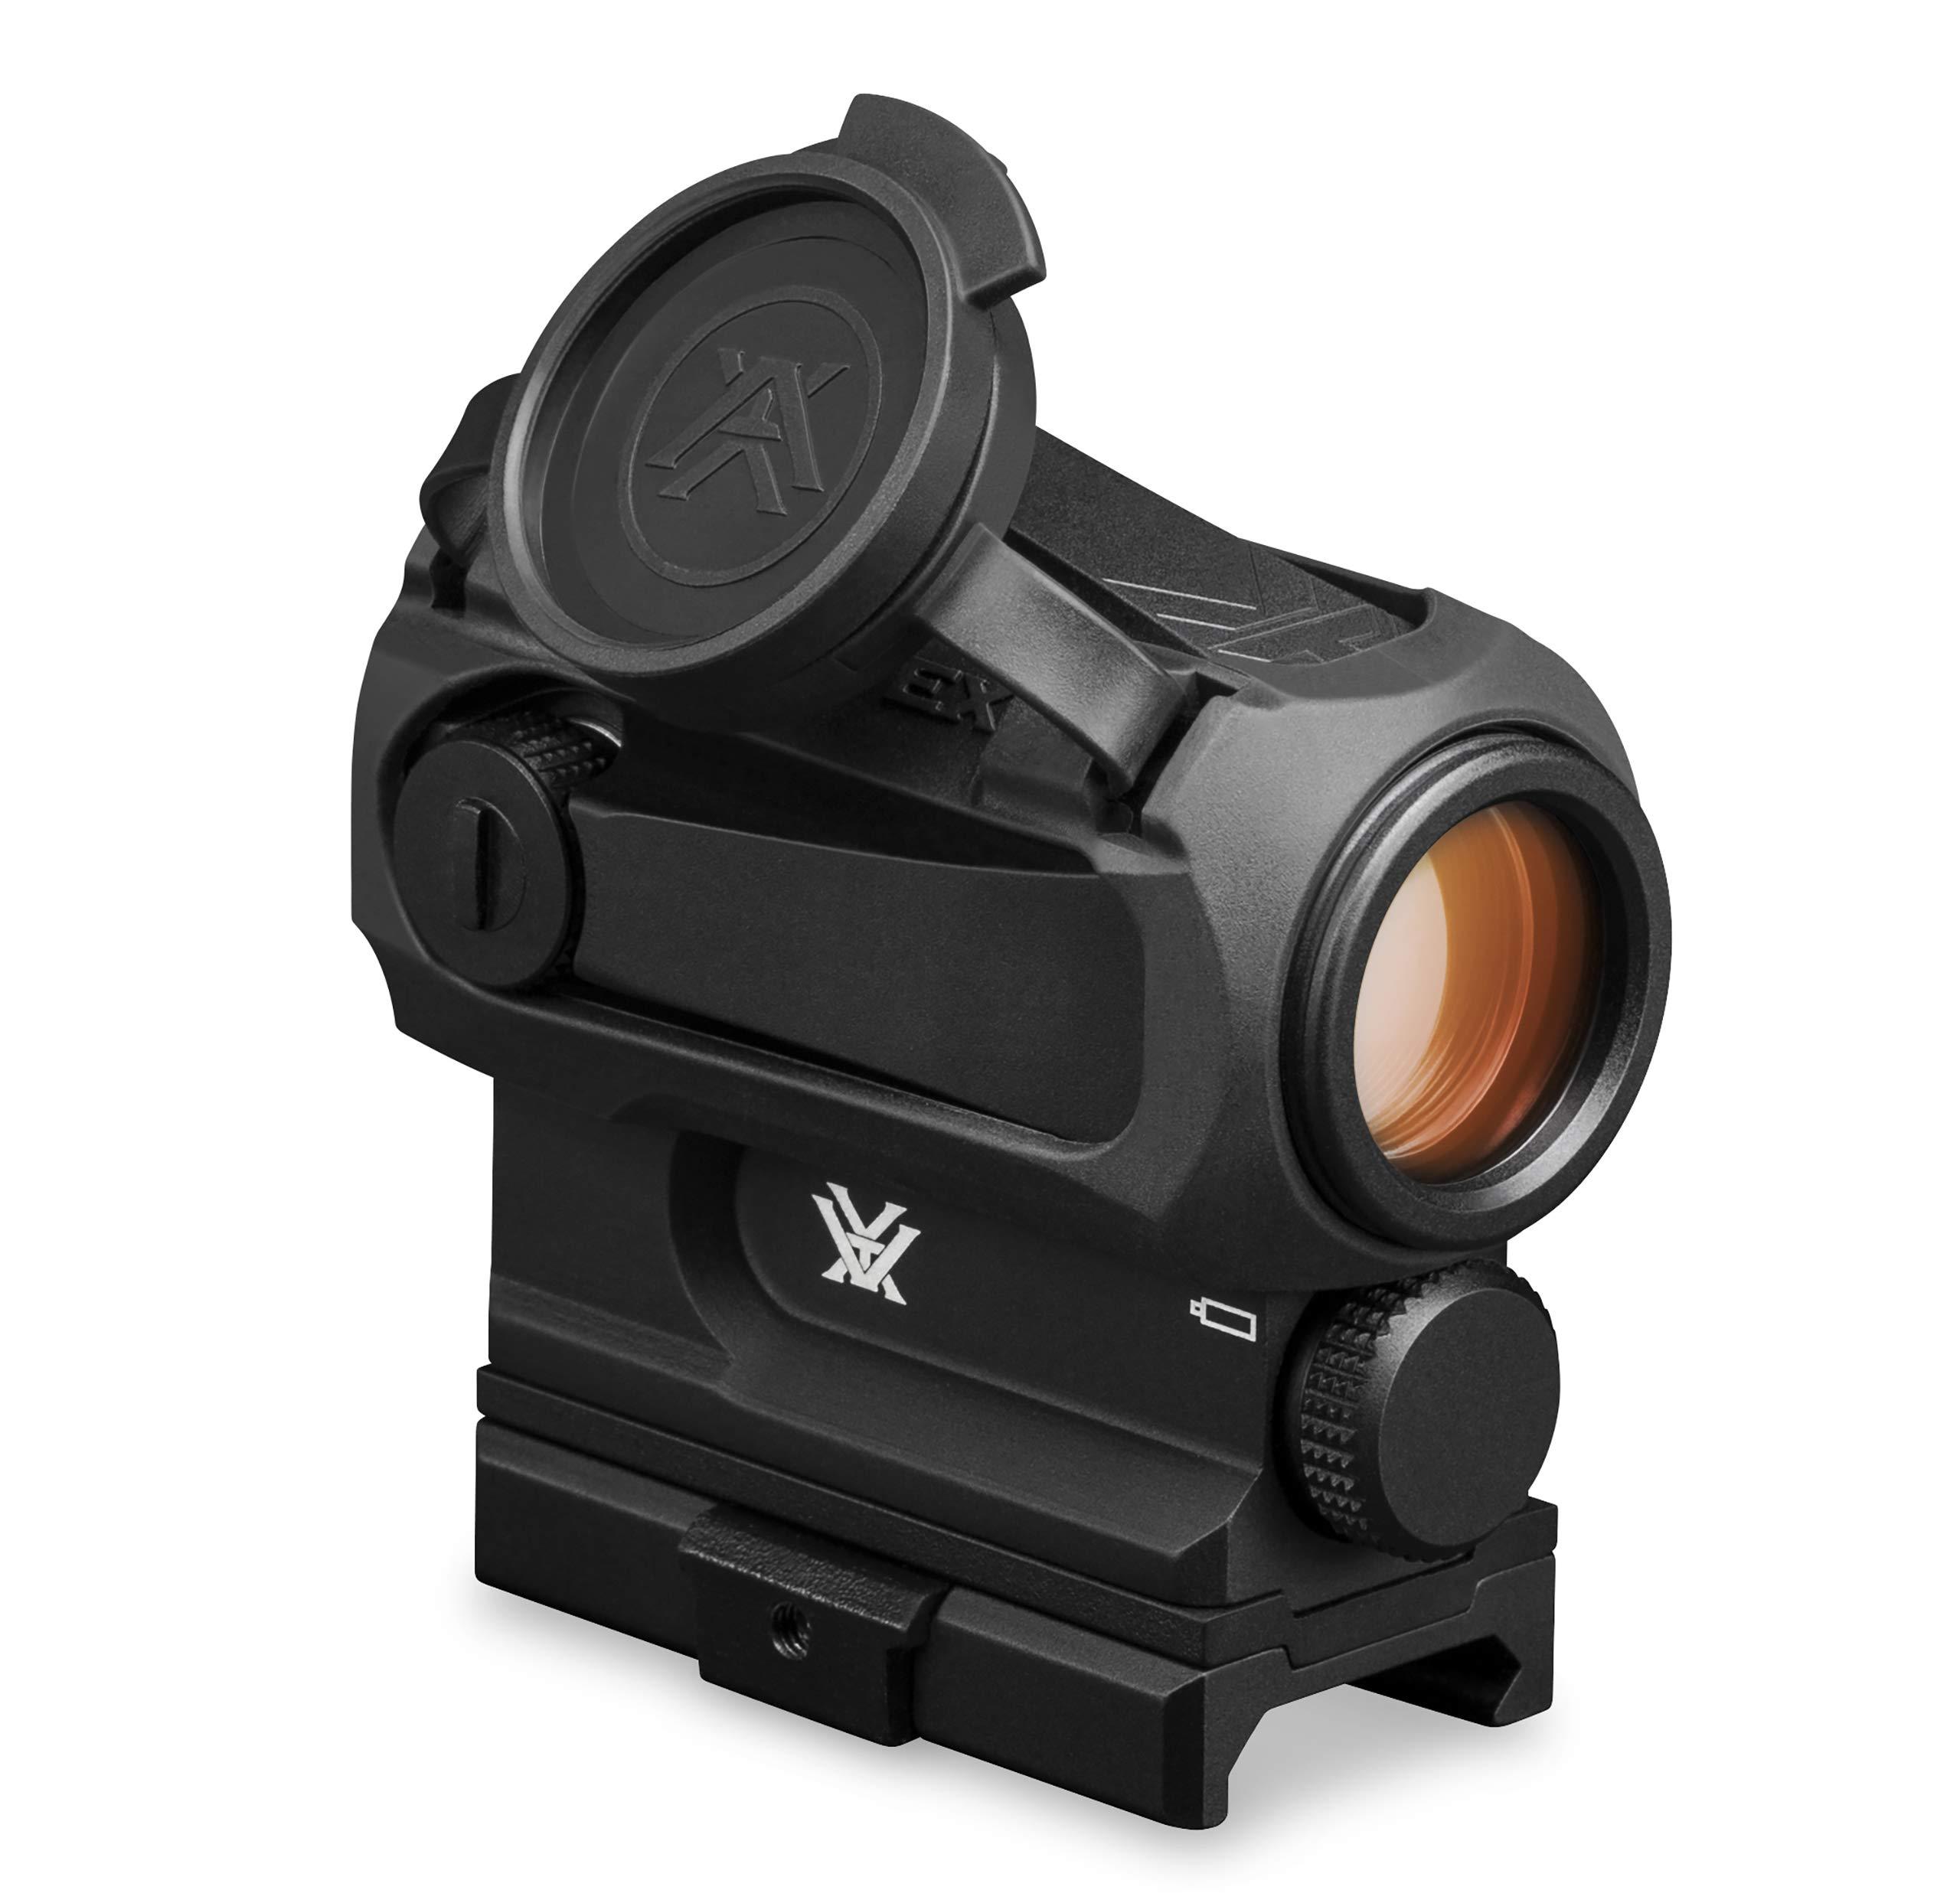 Vortex Optics SPARC Red Dot Sight - 2 MOA Dot